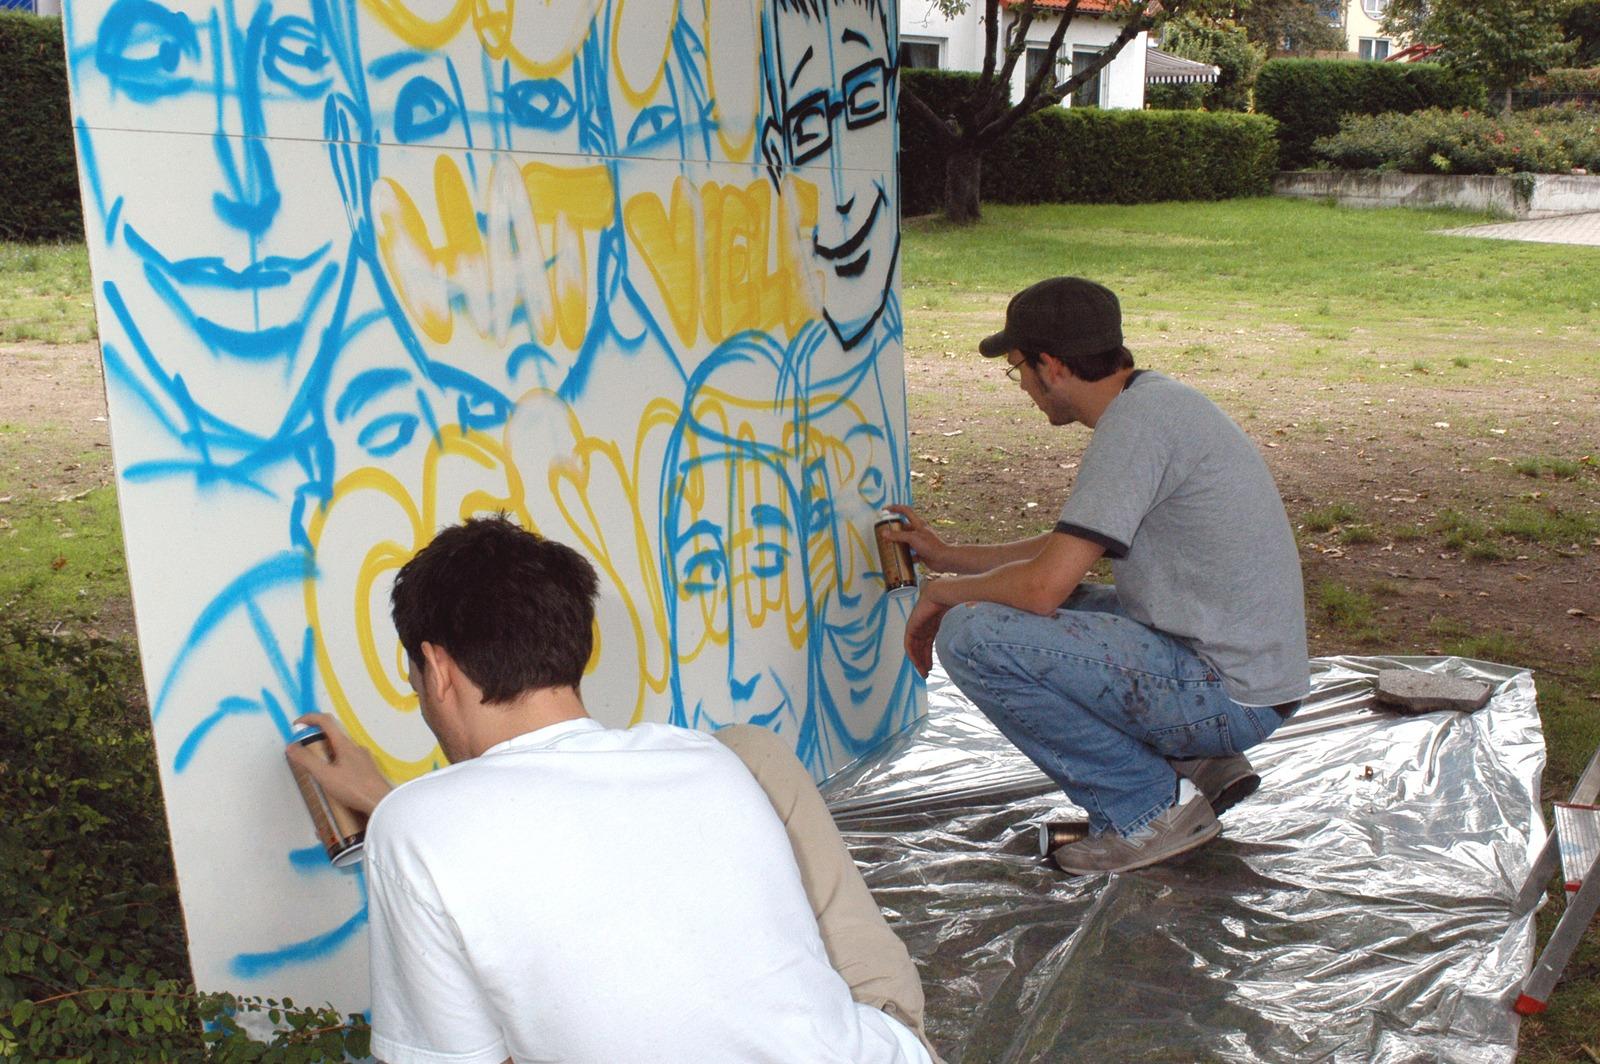 graffitiauftrag-graffitikuenstler-graffitikids-artmos4-kirchliche-einrichtung-event-graffiti-ingelheim